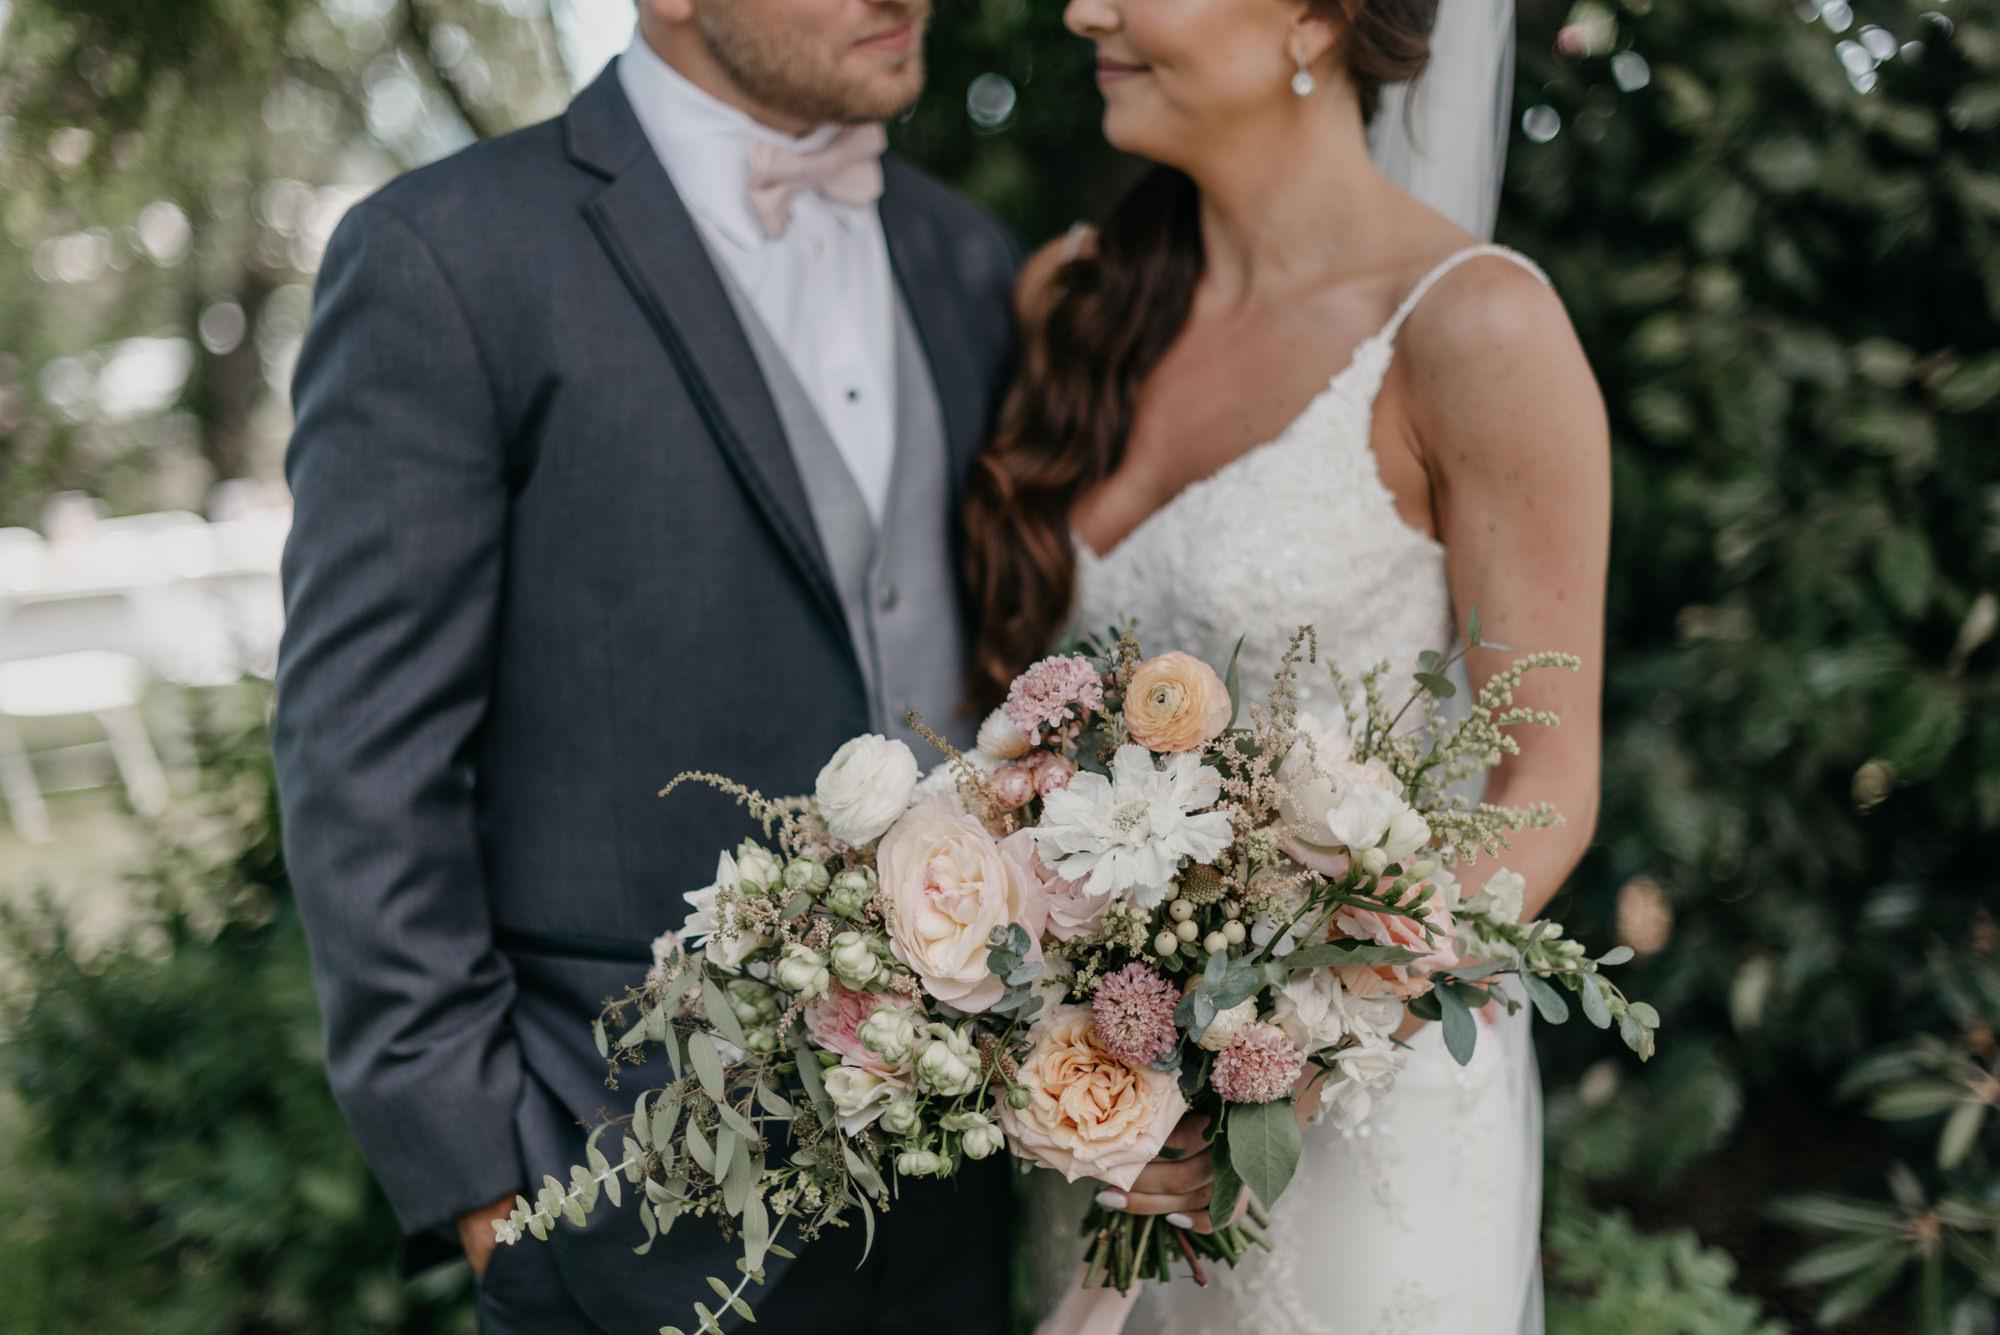 79-lake-oswego-wedding-portland-couple-rose-tree.jpg